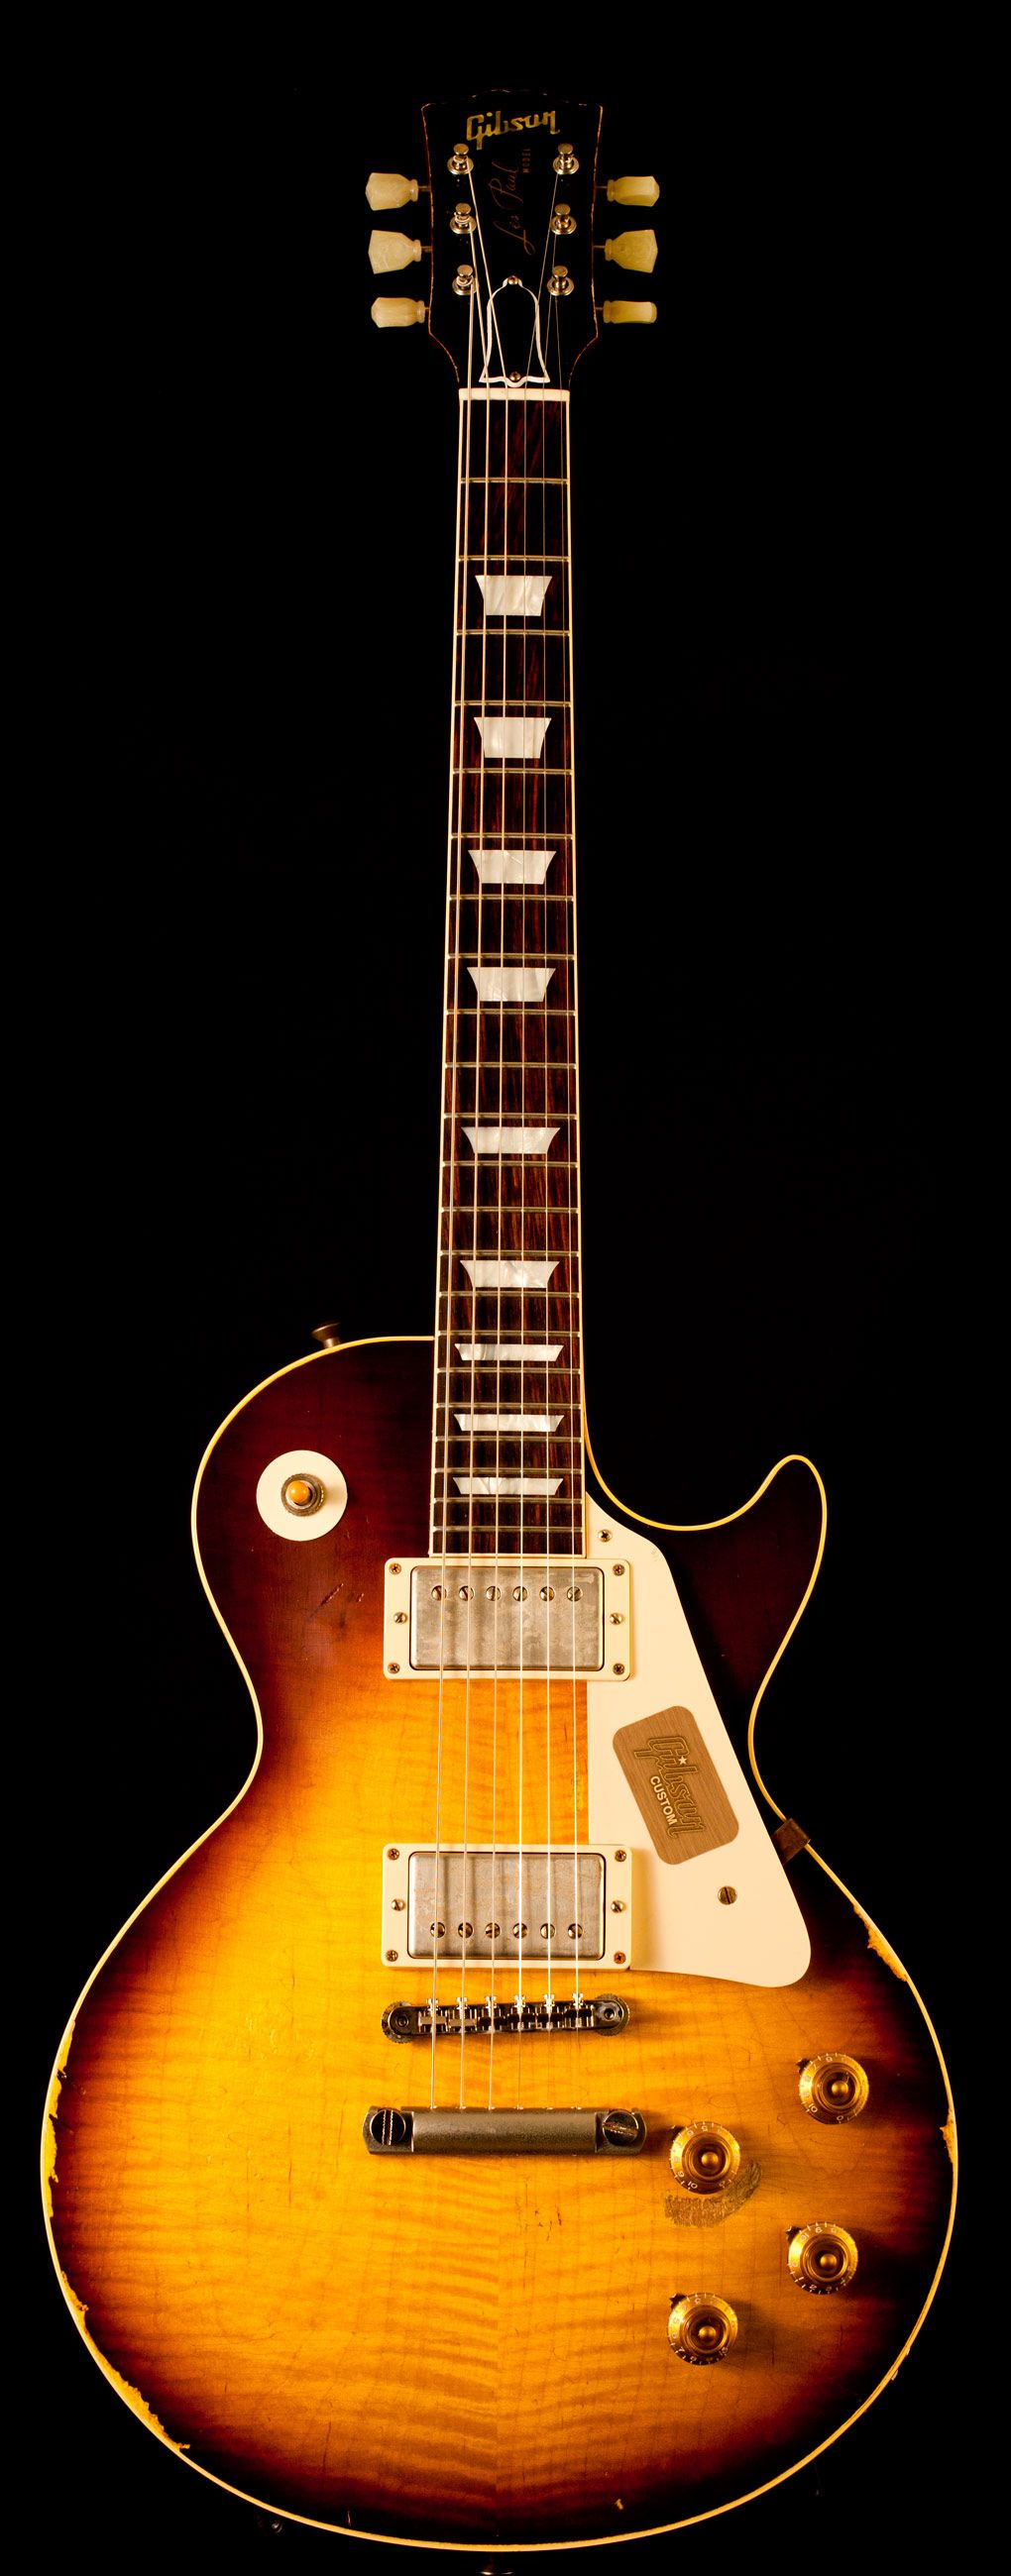 Pin By Jh Quarta On Guitars Classic Guitar Les Paul Guitars Electric Guitar